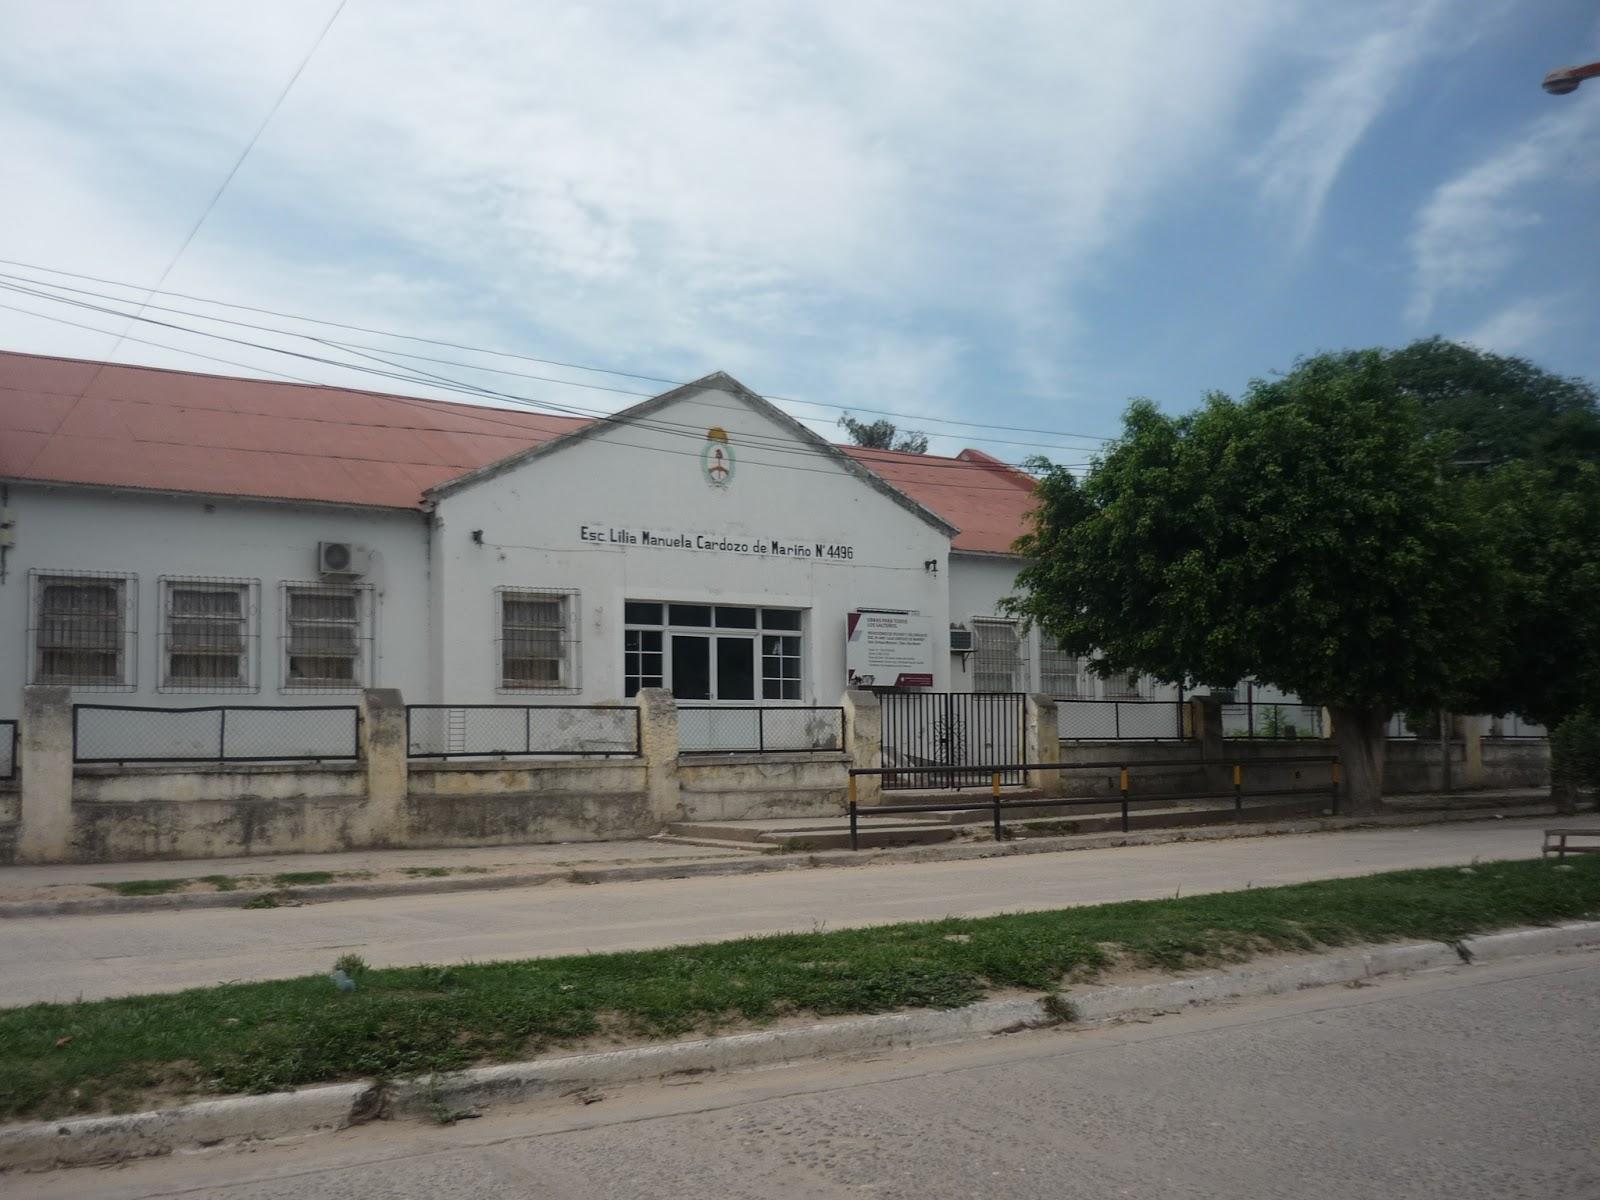 Escuela Lilia Manuela Cardozo